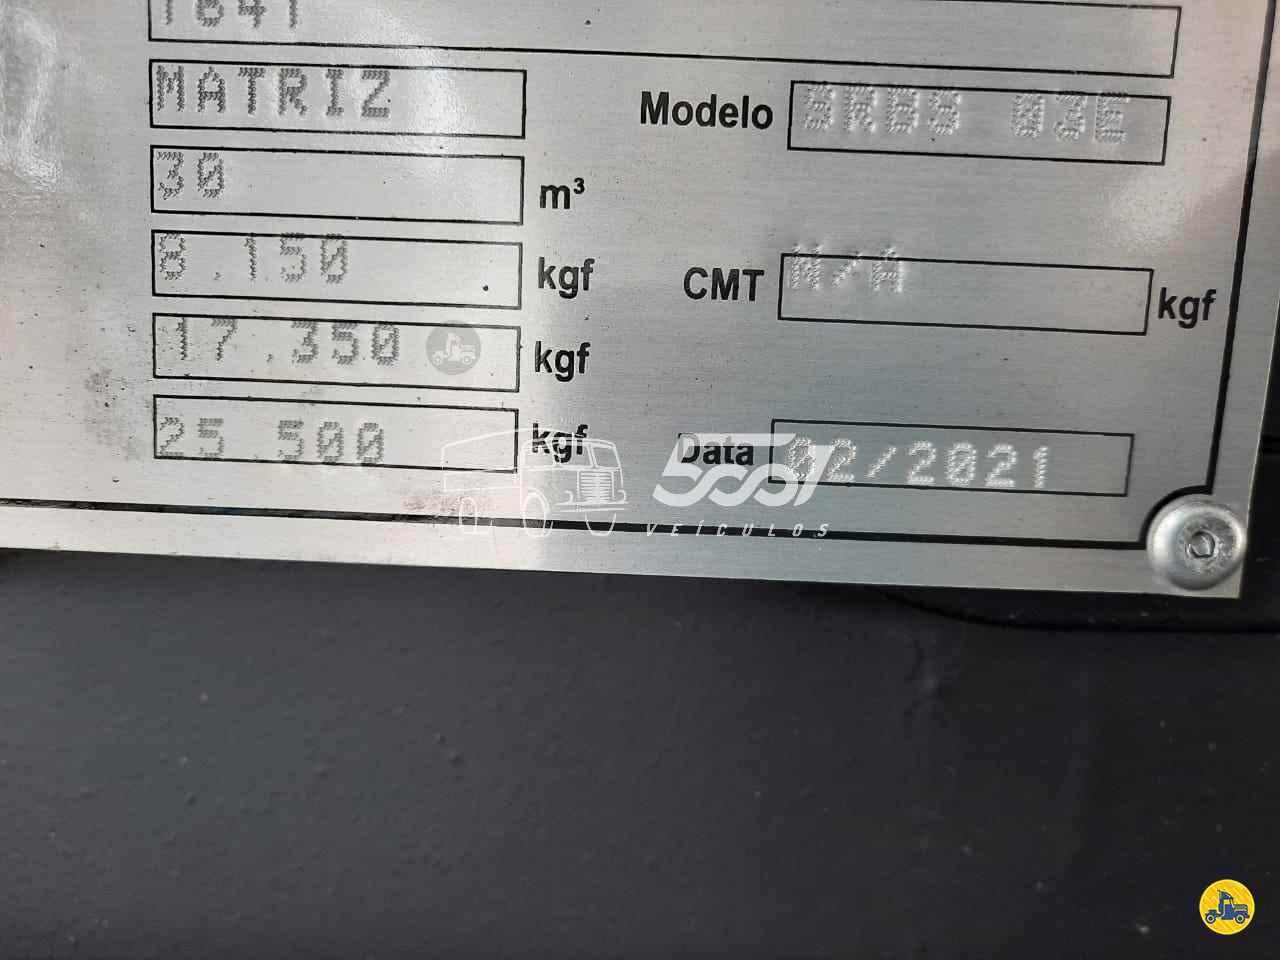 SEMI-REBOQUE BASCULANTE  2021/2021 5001 Veículos - Ponta Grossa